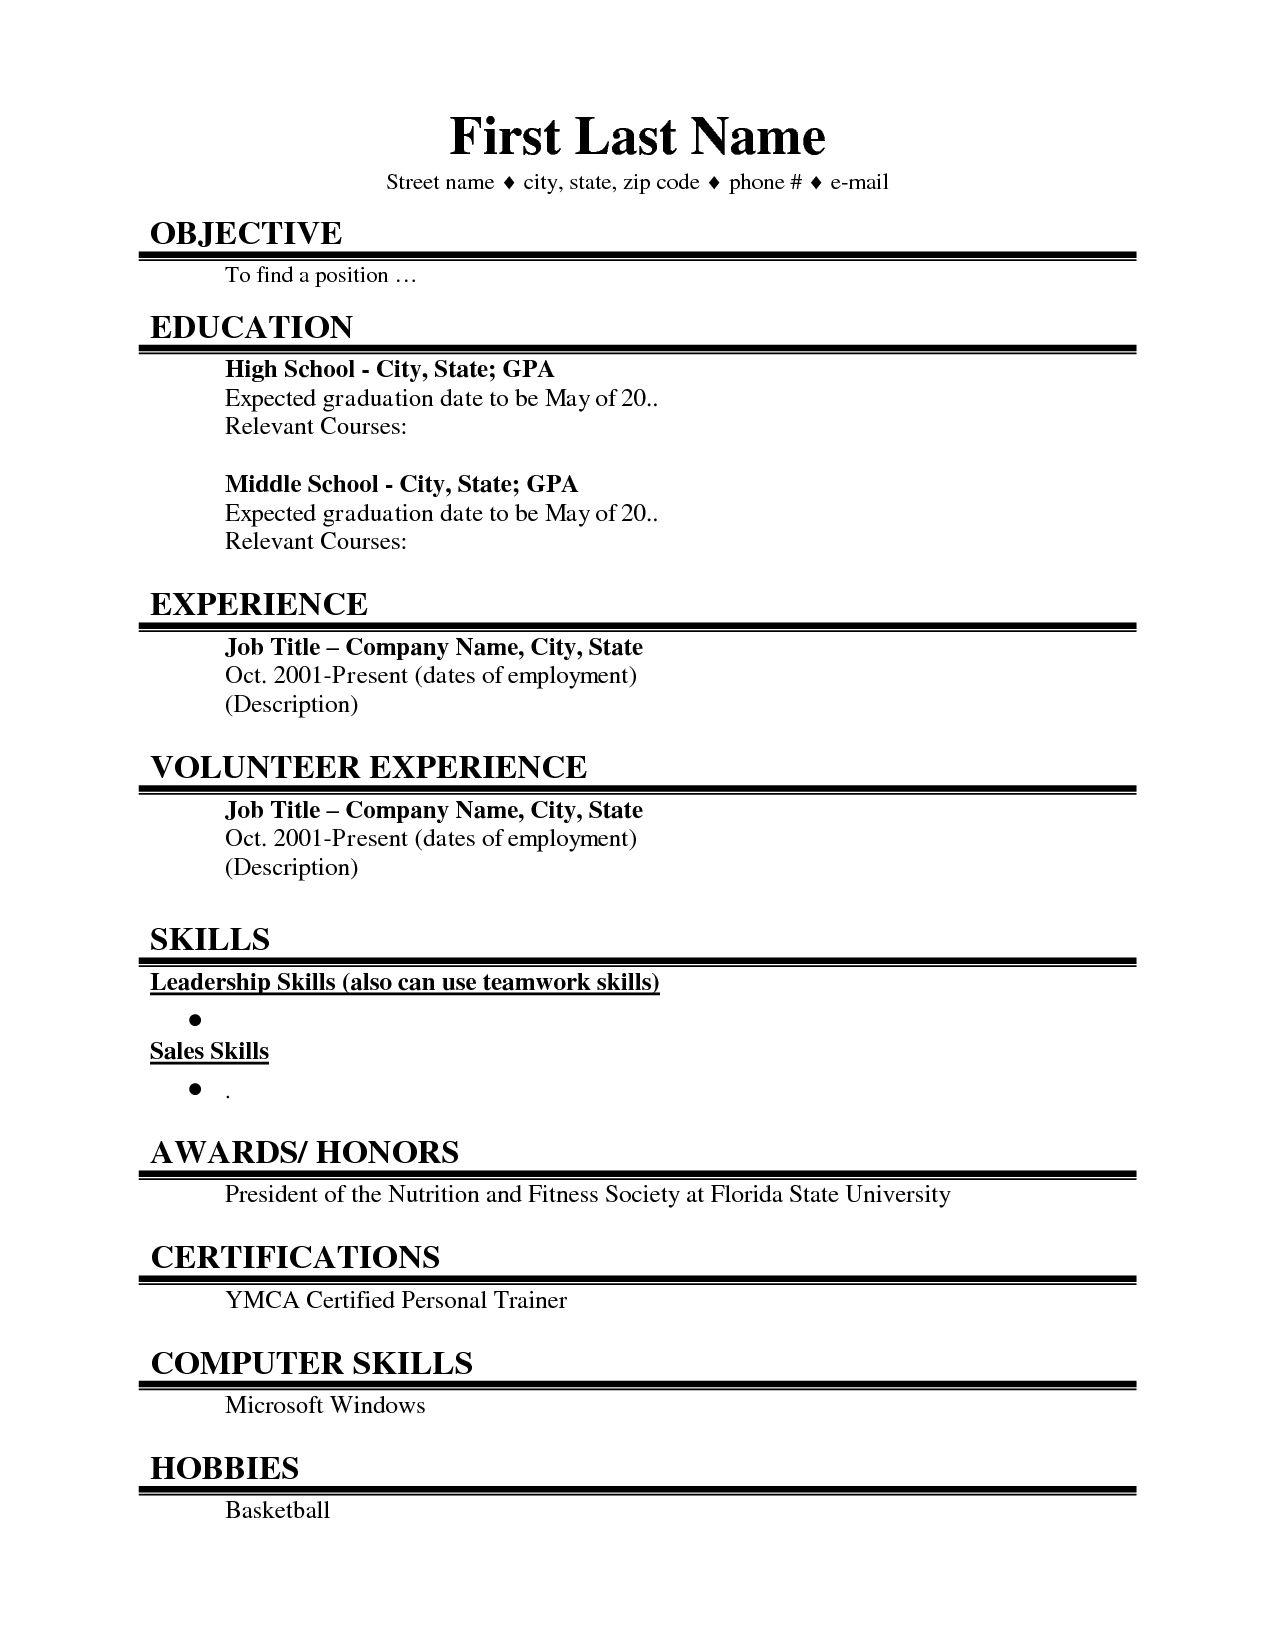 First Job Resume Google Search Resume Pinterest Job Resume Throughout High School Student Resu In 2020 Job Resume Examples First Job Resume Job Resume Template